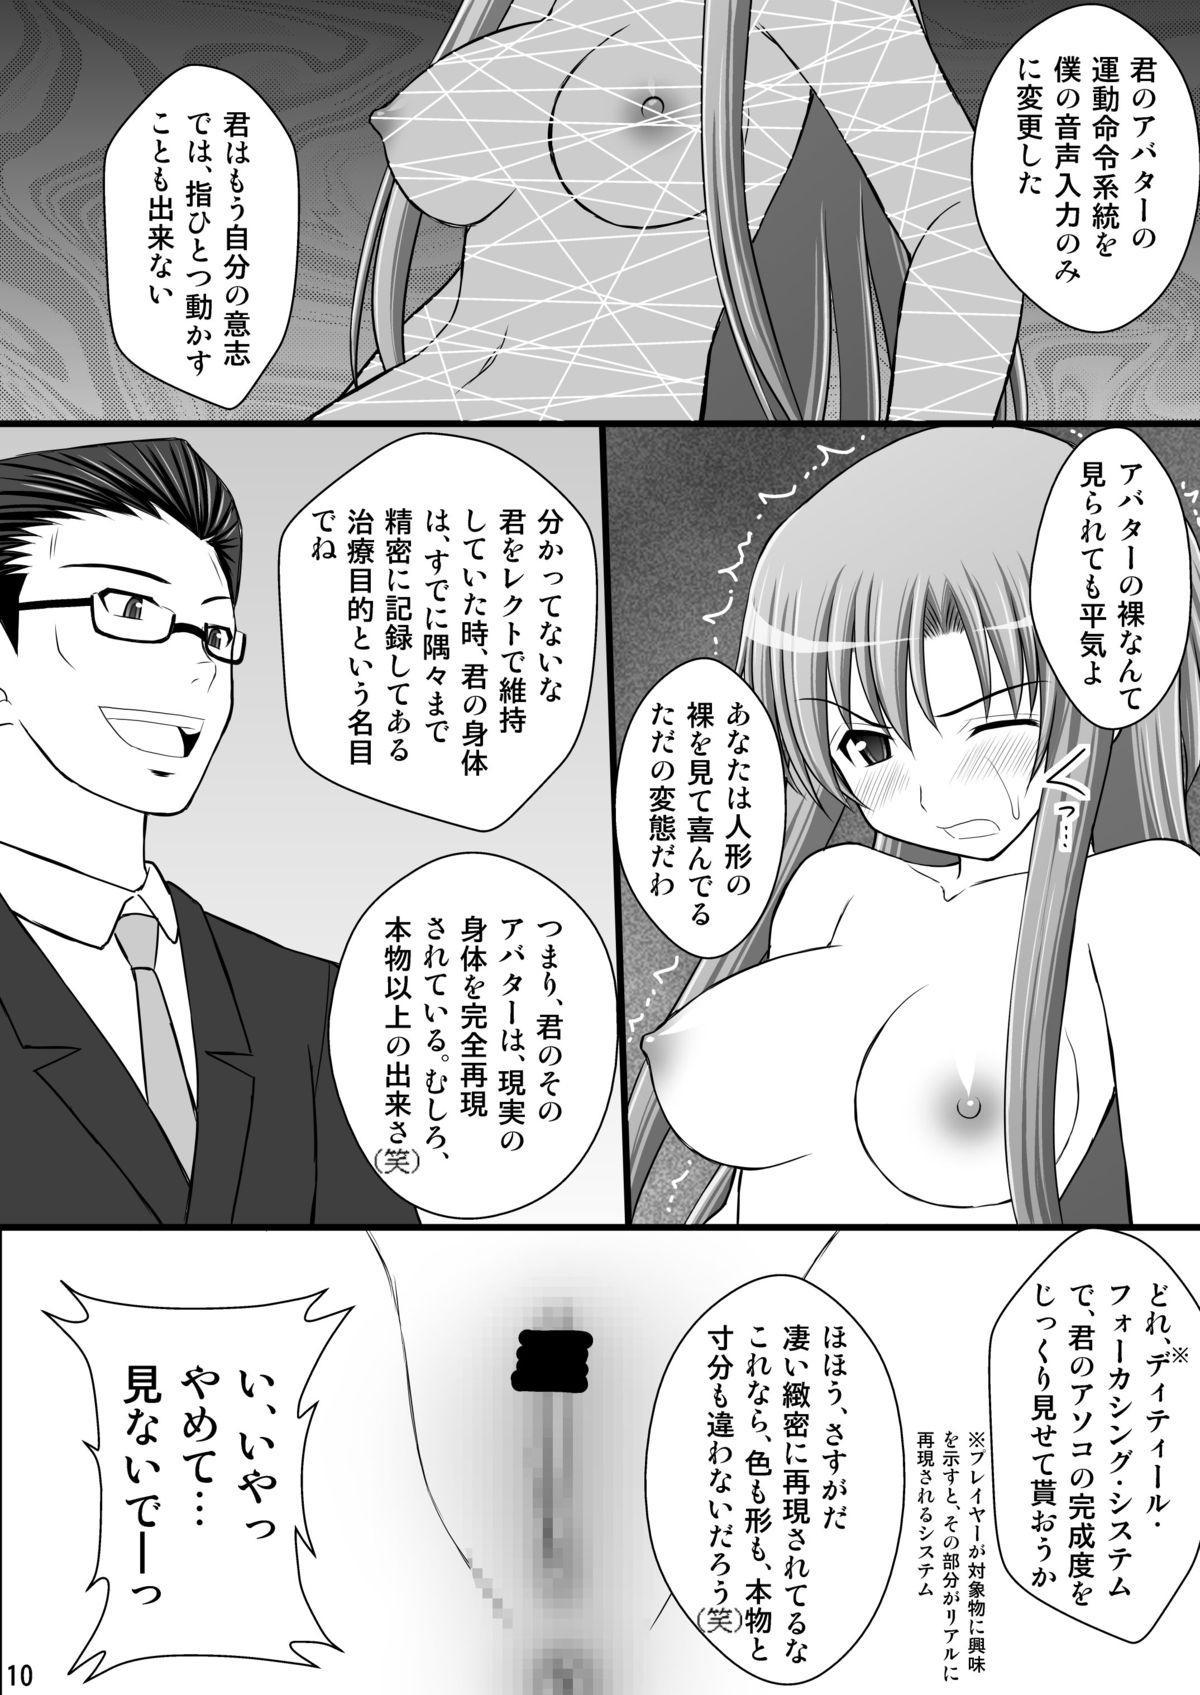 Toraware Hime I - System Master Nyaa Sakarae nee 8